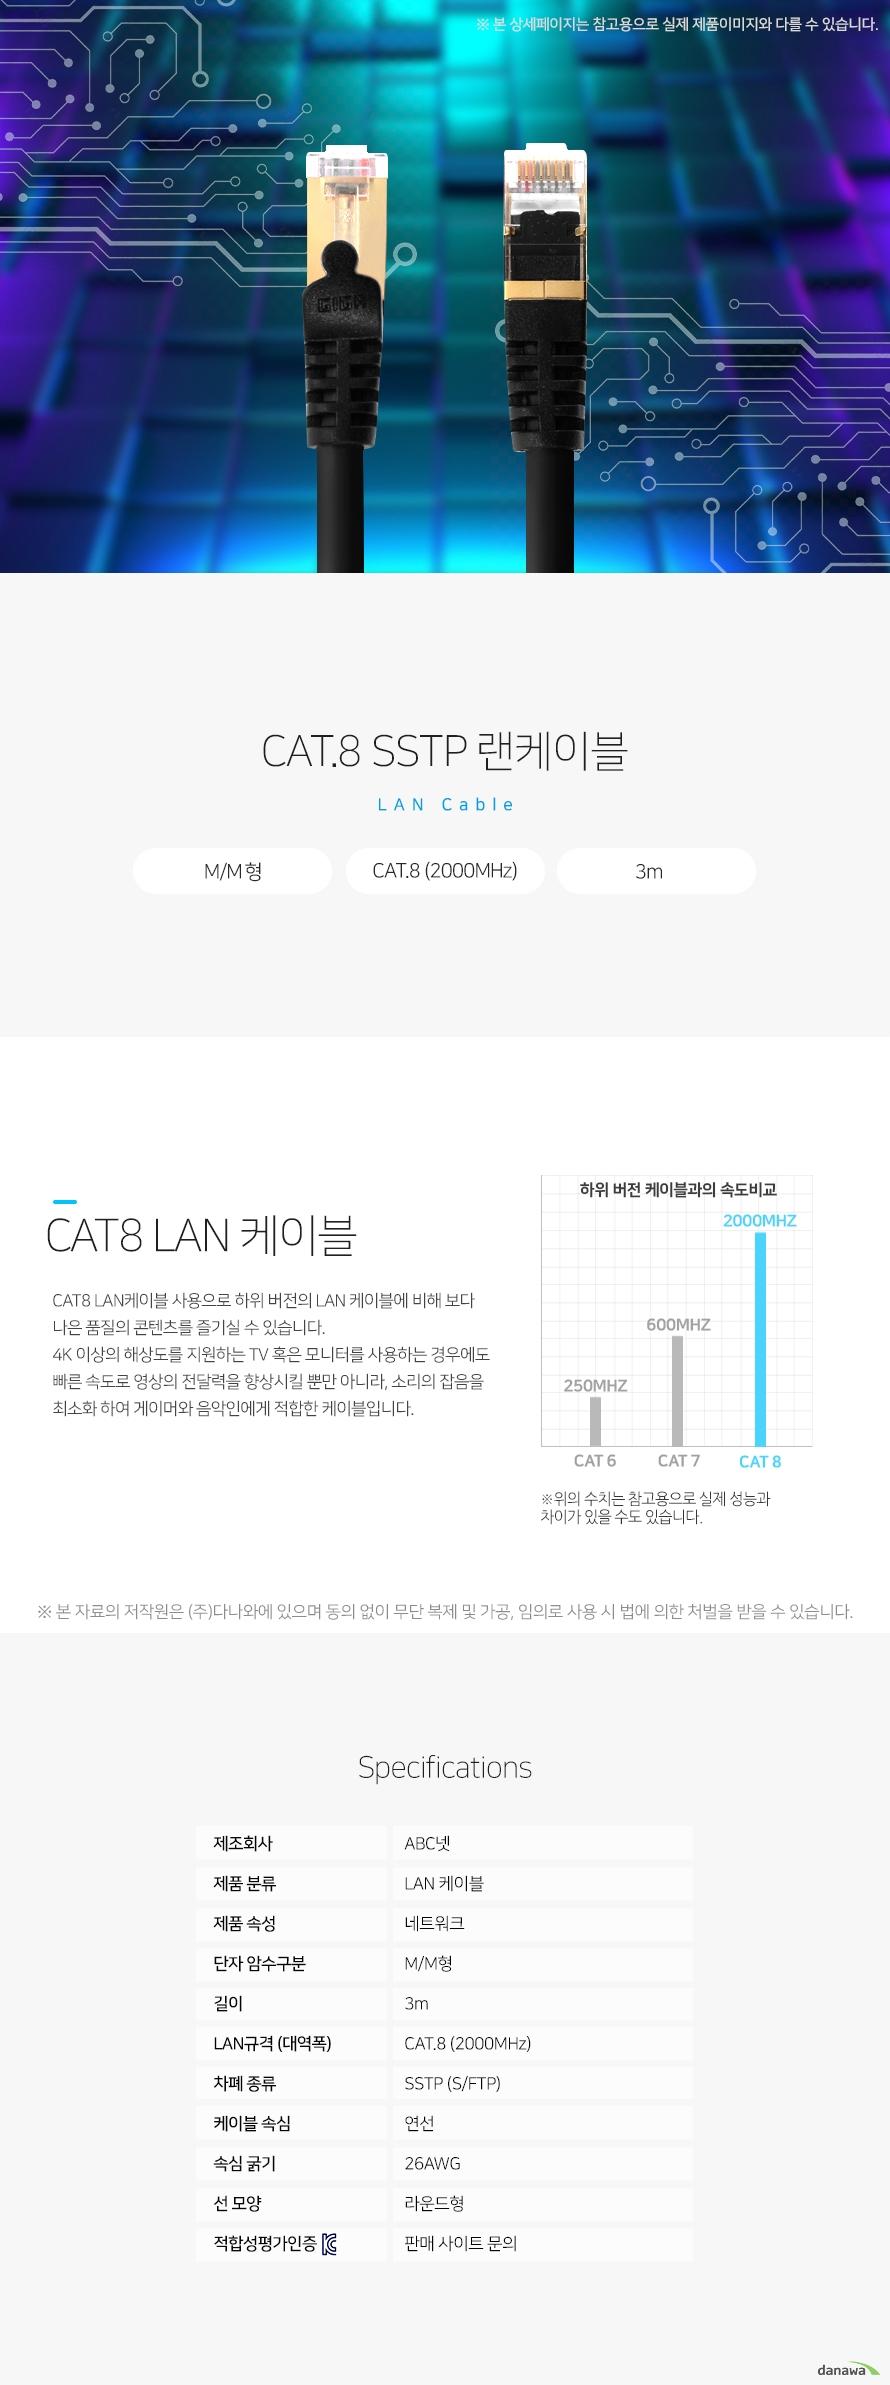 ABC넷 CAT.8 SSTP 랜케이블 (3m) 상세 스펙 LAN 케이블 / 네트워크 / M/M형 / CAT.8 (2000MHz) / SSTP (S/FTP) / 연선 / 26AWG / 라운드형 / RJ45 / RJ45